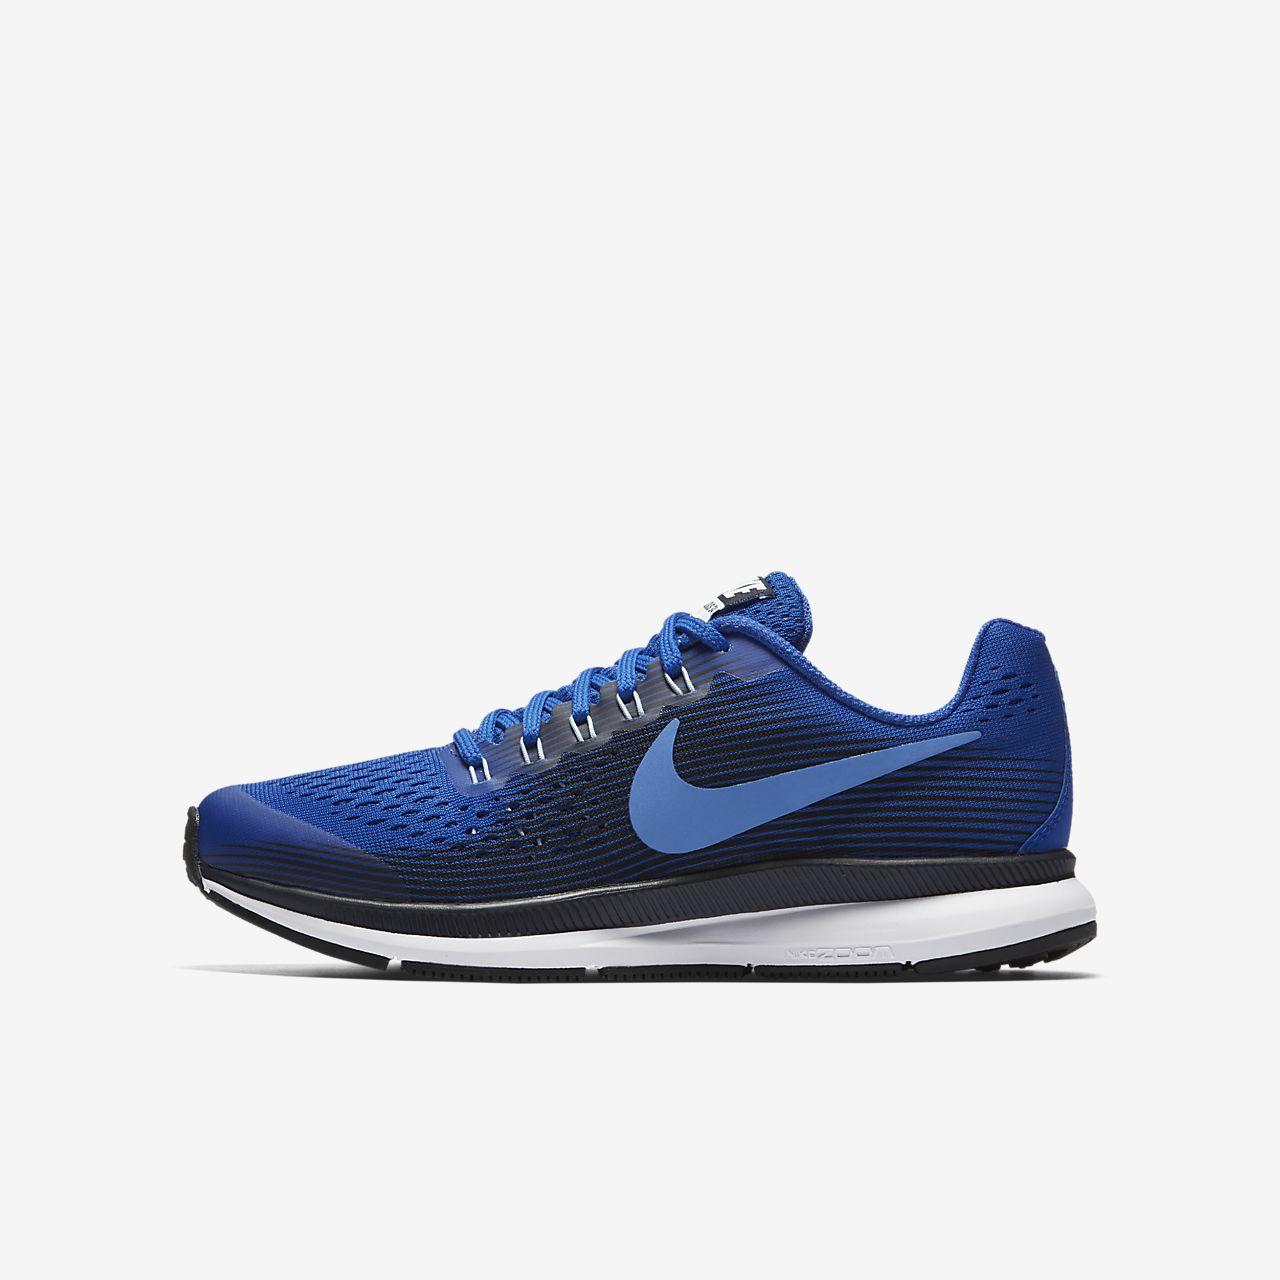 sports shoes 77d34 69298 Calzado de running para niños Nike Zoom Pegasus 34